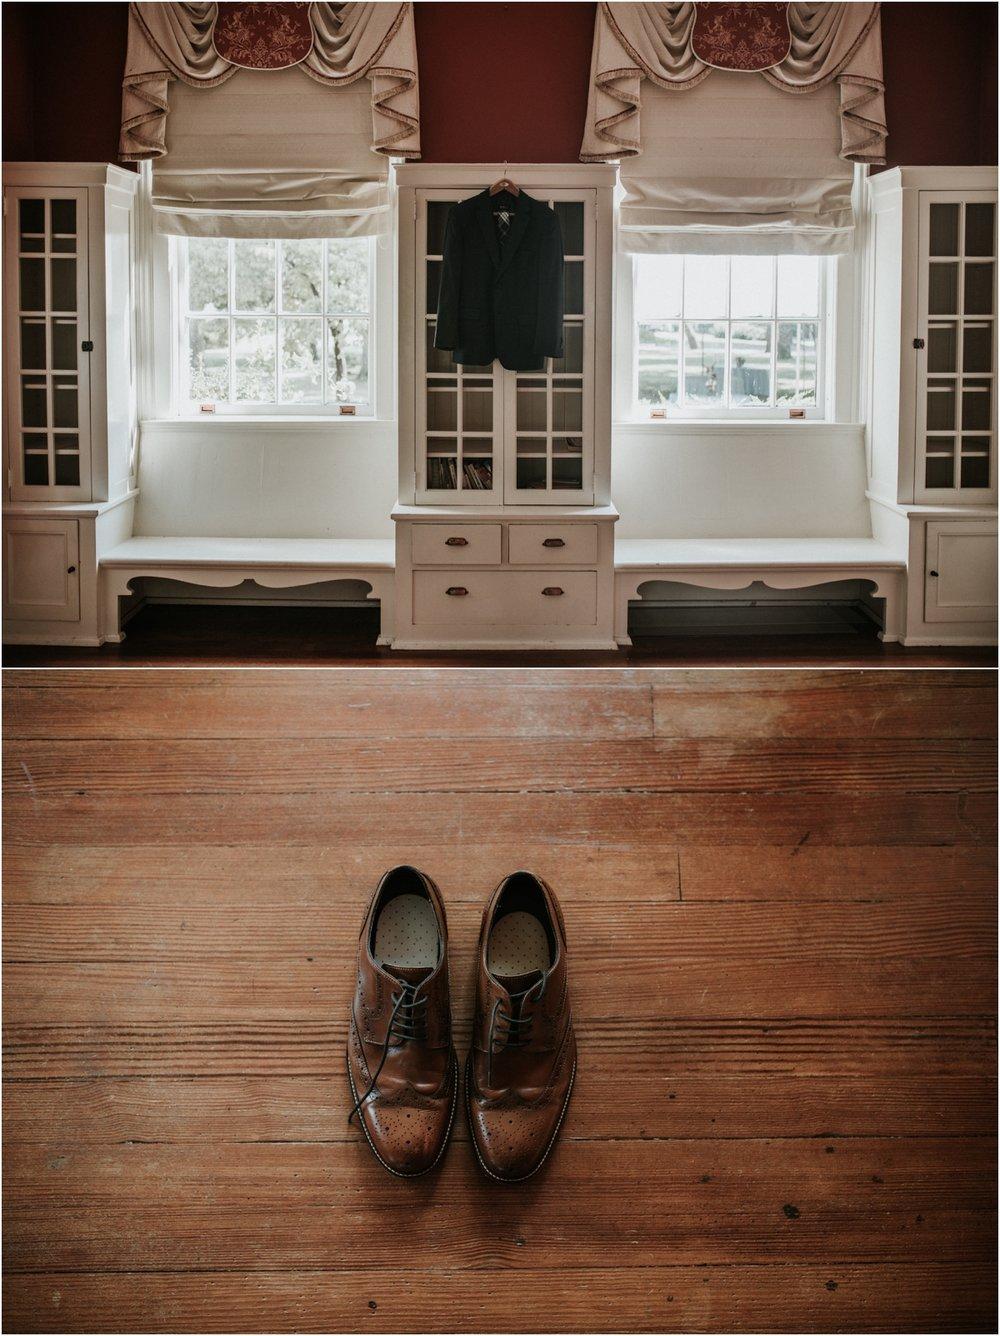 Stowe-manor-wedding-belmont-nc_0009.jpg